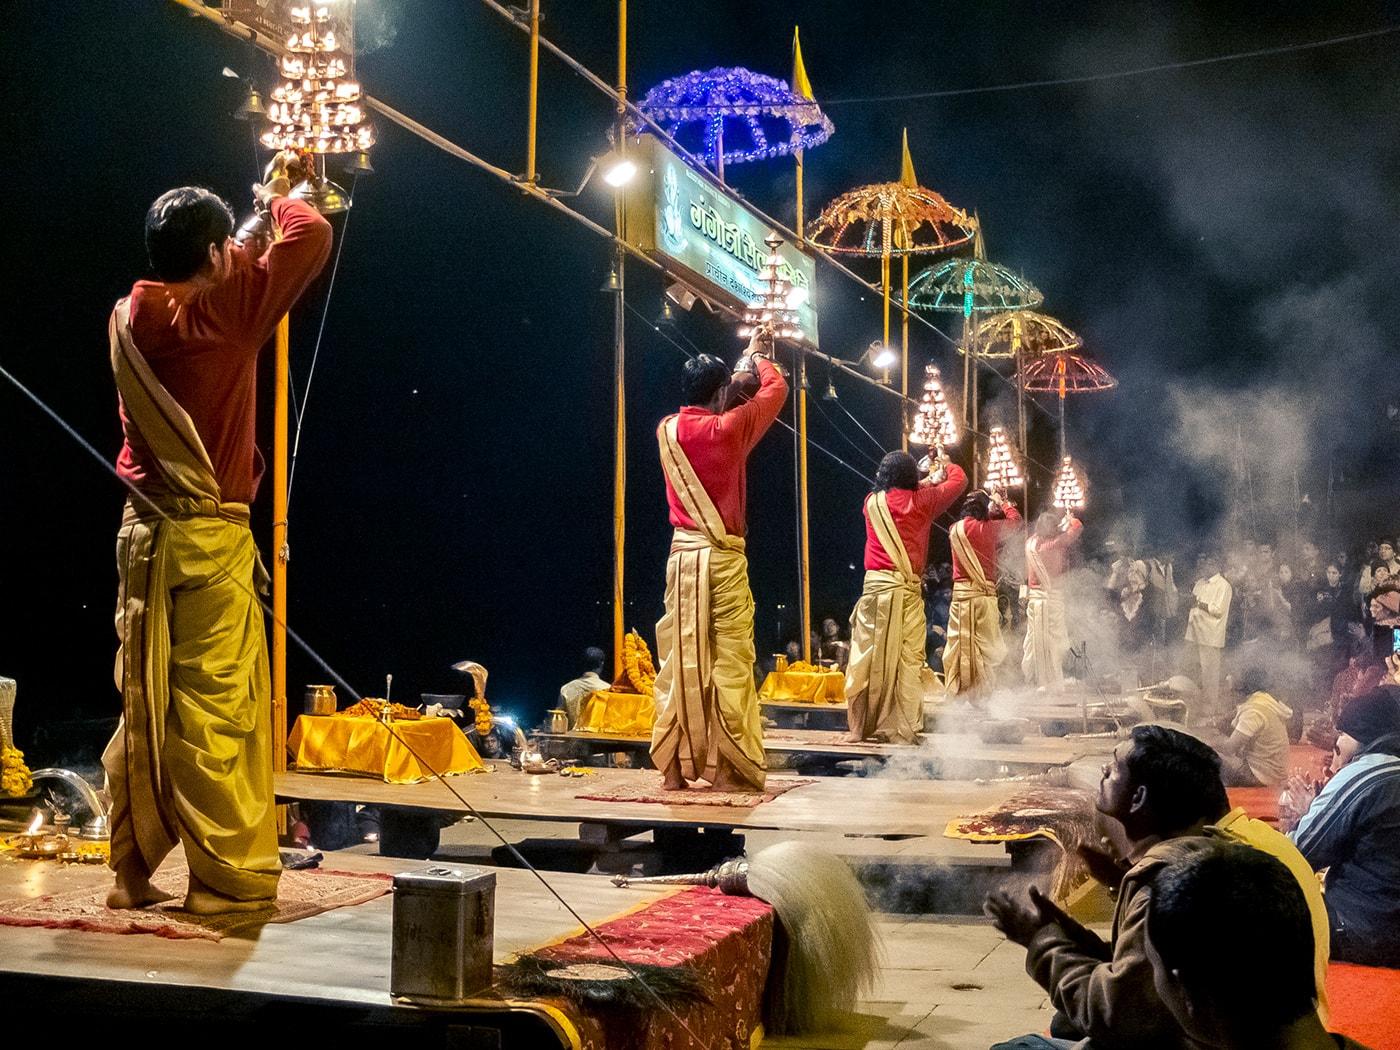 cultura indiana varanasi cerimonia dashaswamedh ghat